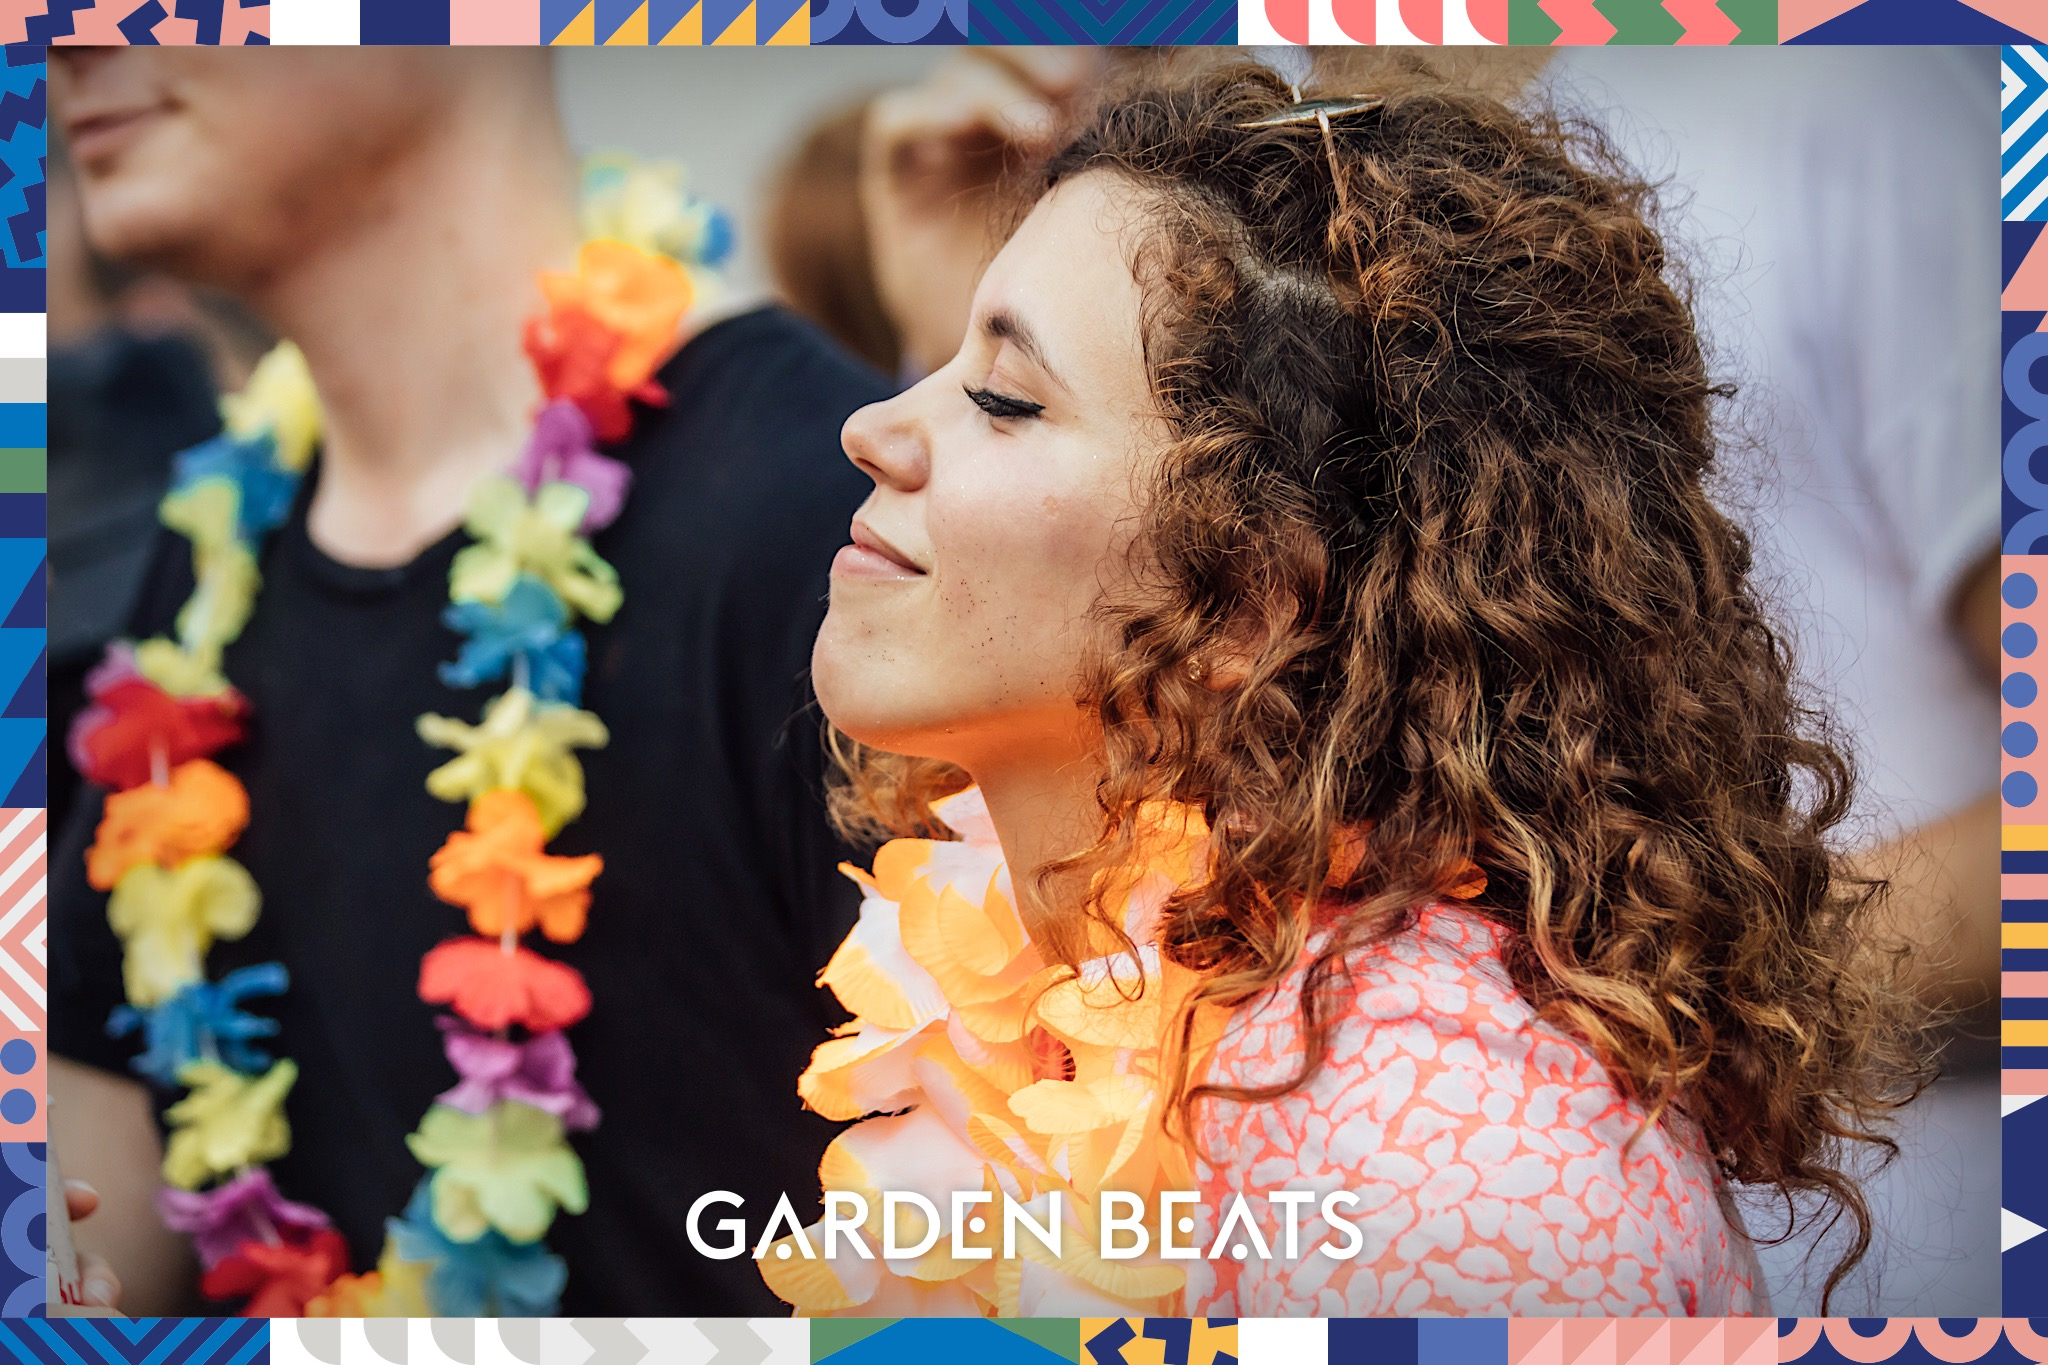 18032017_GardenBeats_Colossal564_WatermarkedGB.jpg